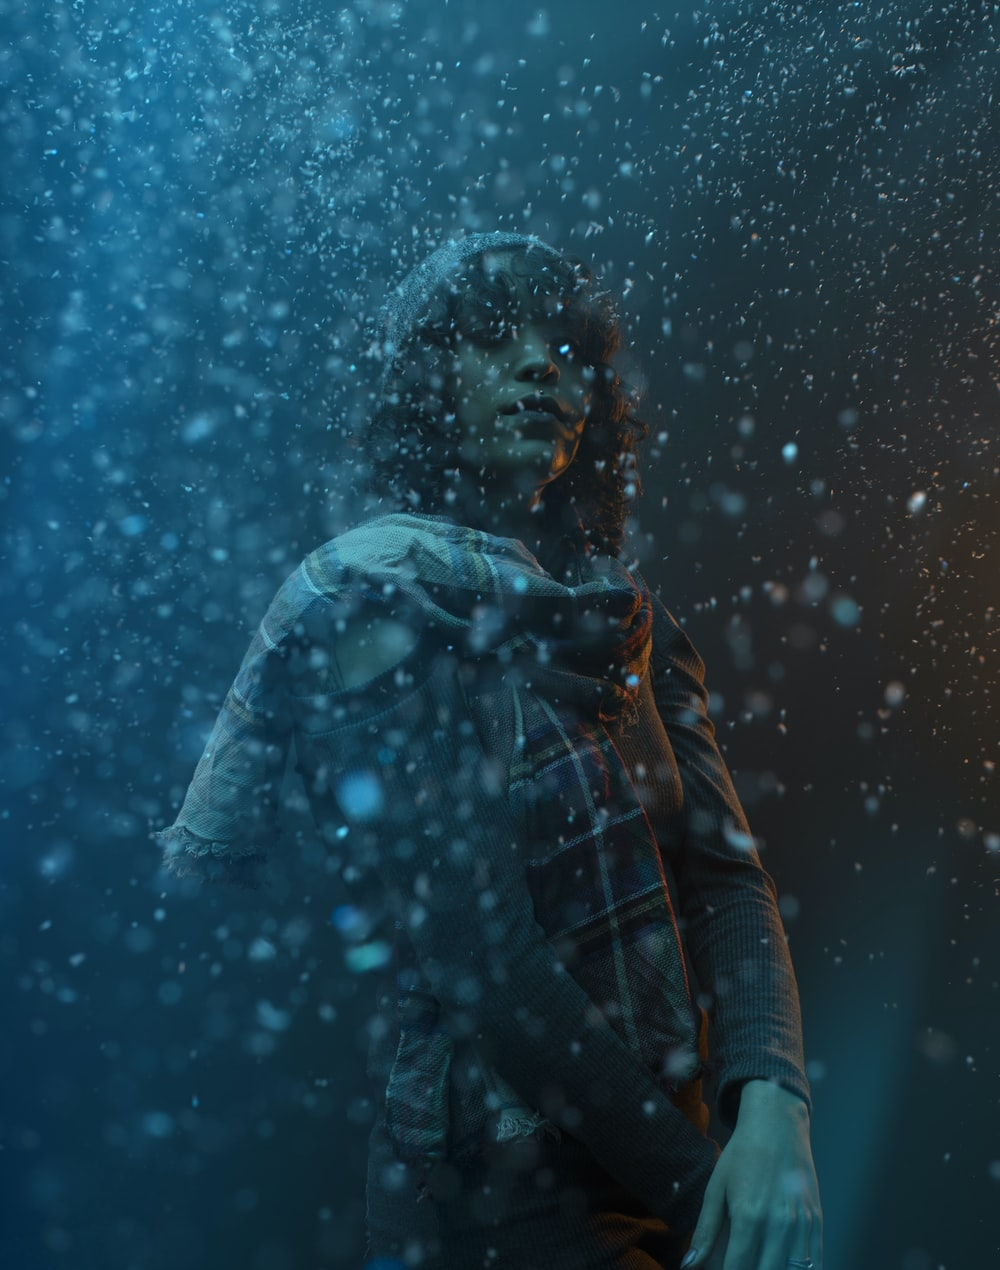 woman in blue jacket standing